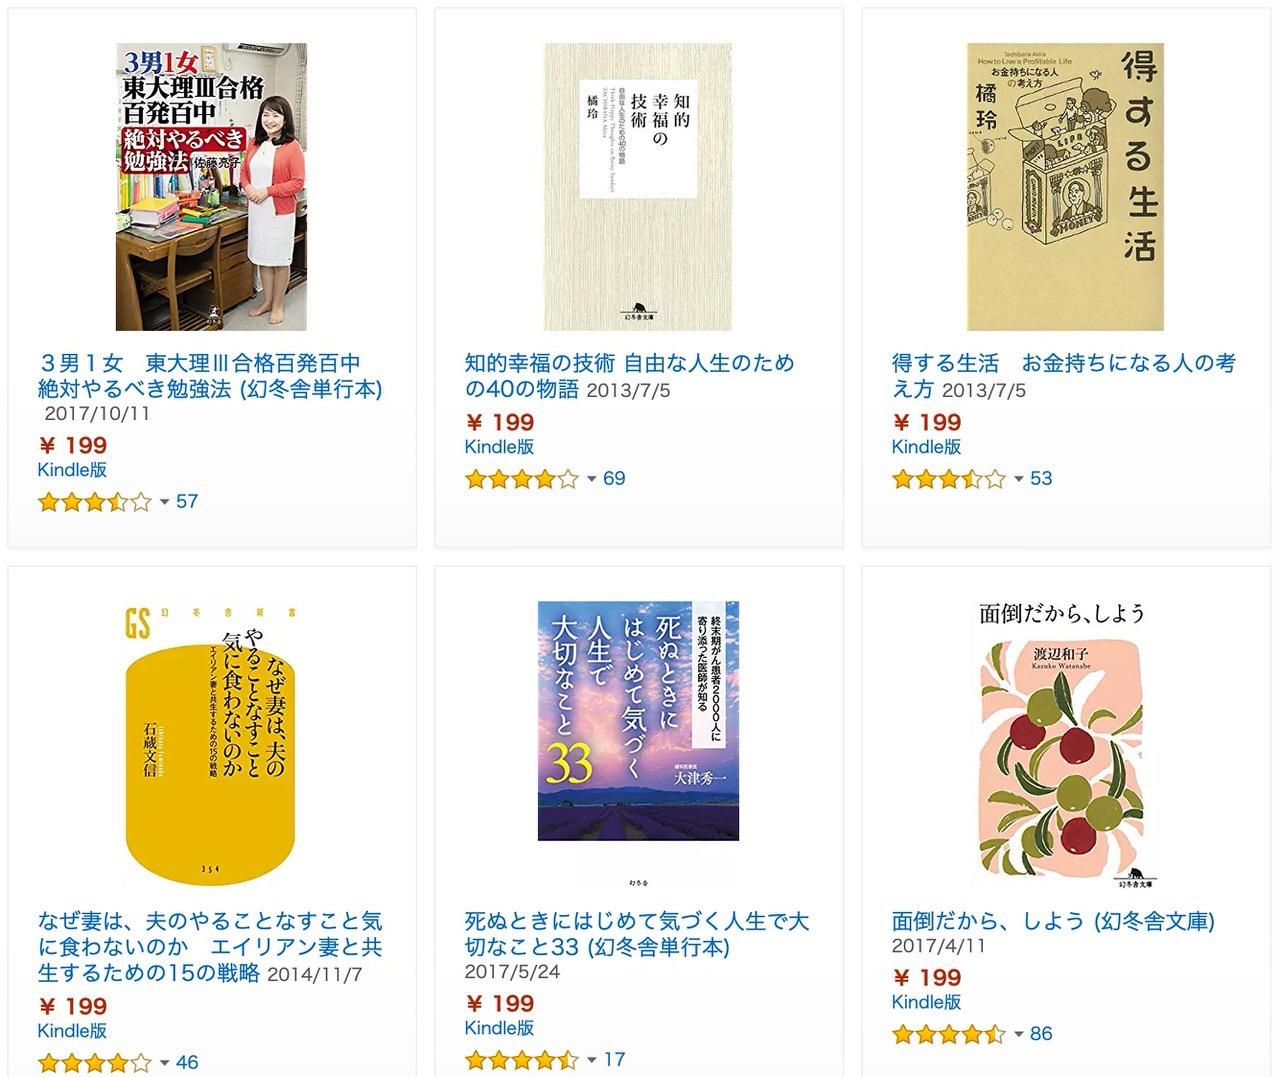 【Kindleセール】「幻冬舎の実用書フェア」2週間で小説を書く!、弱火コントロールで絶対失敗しない料理など(3/14まで)